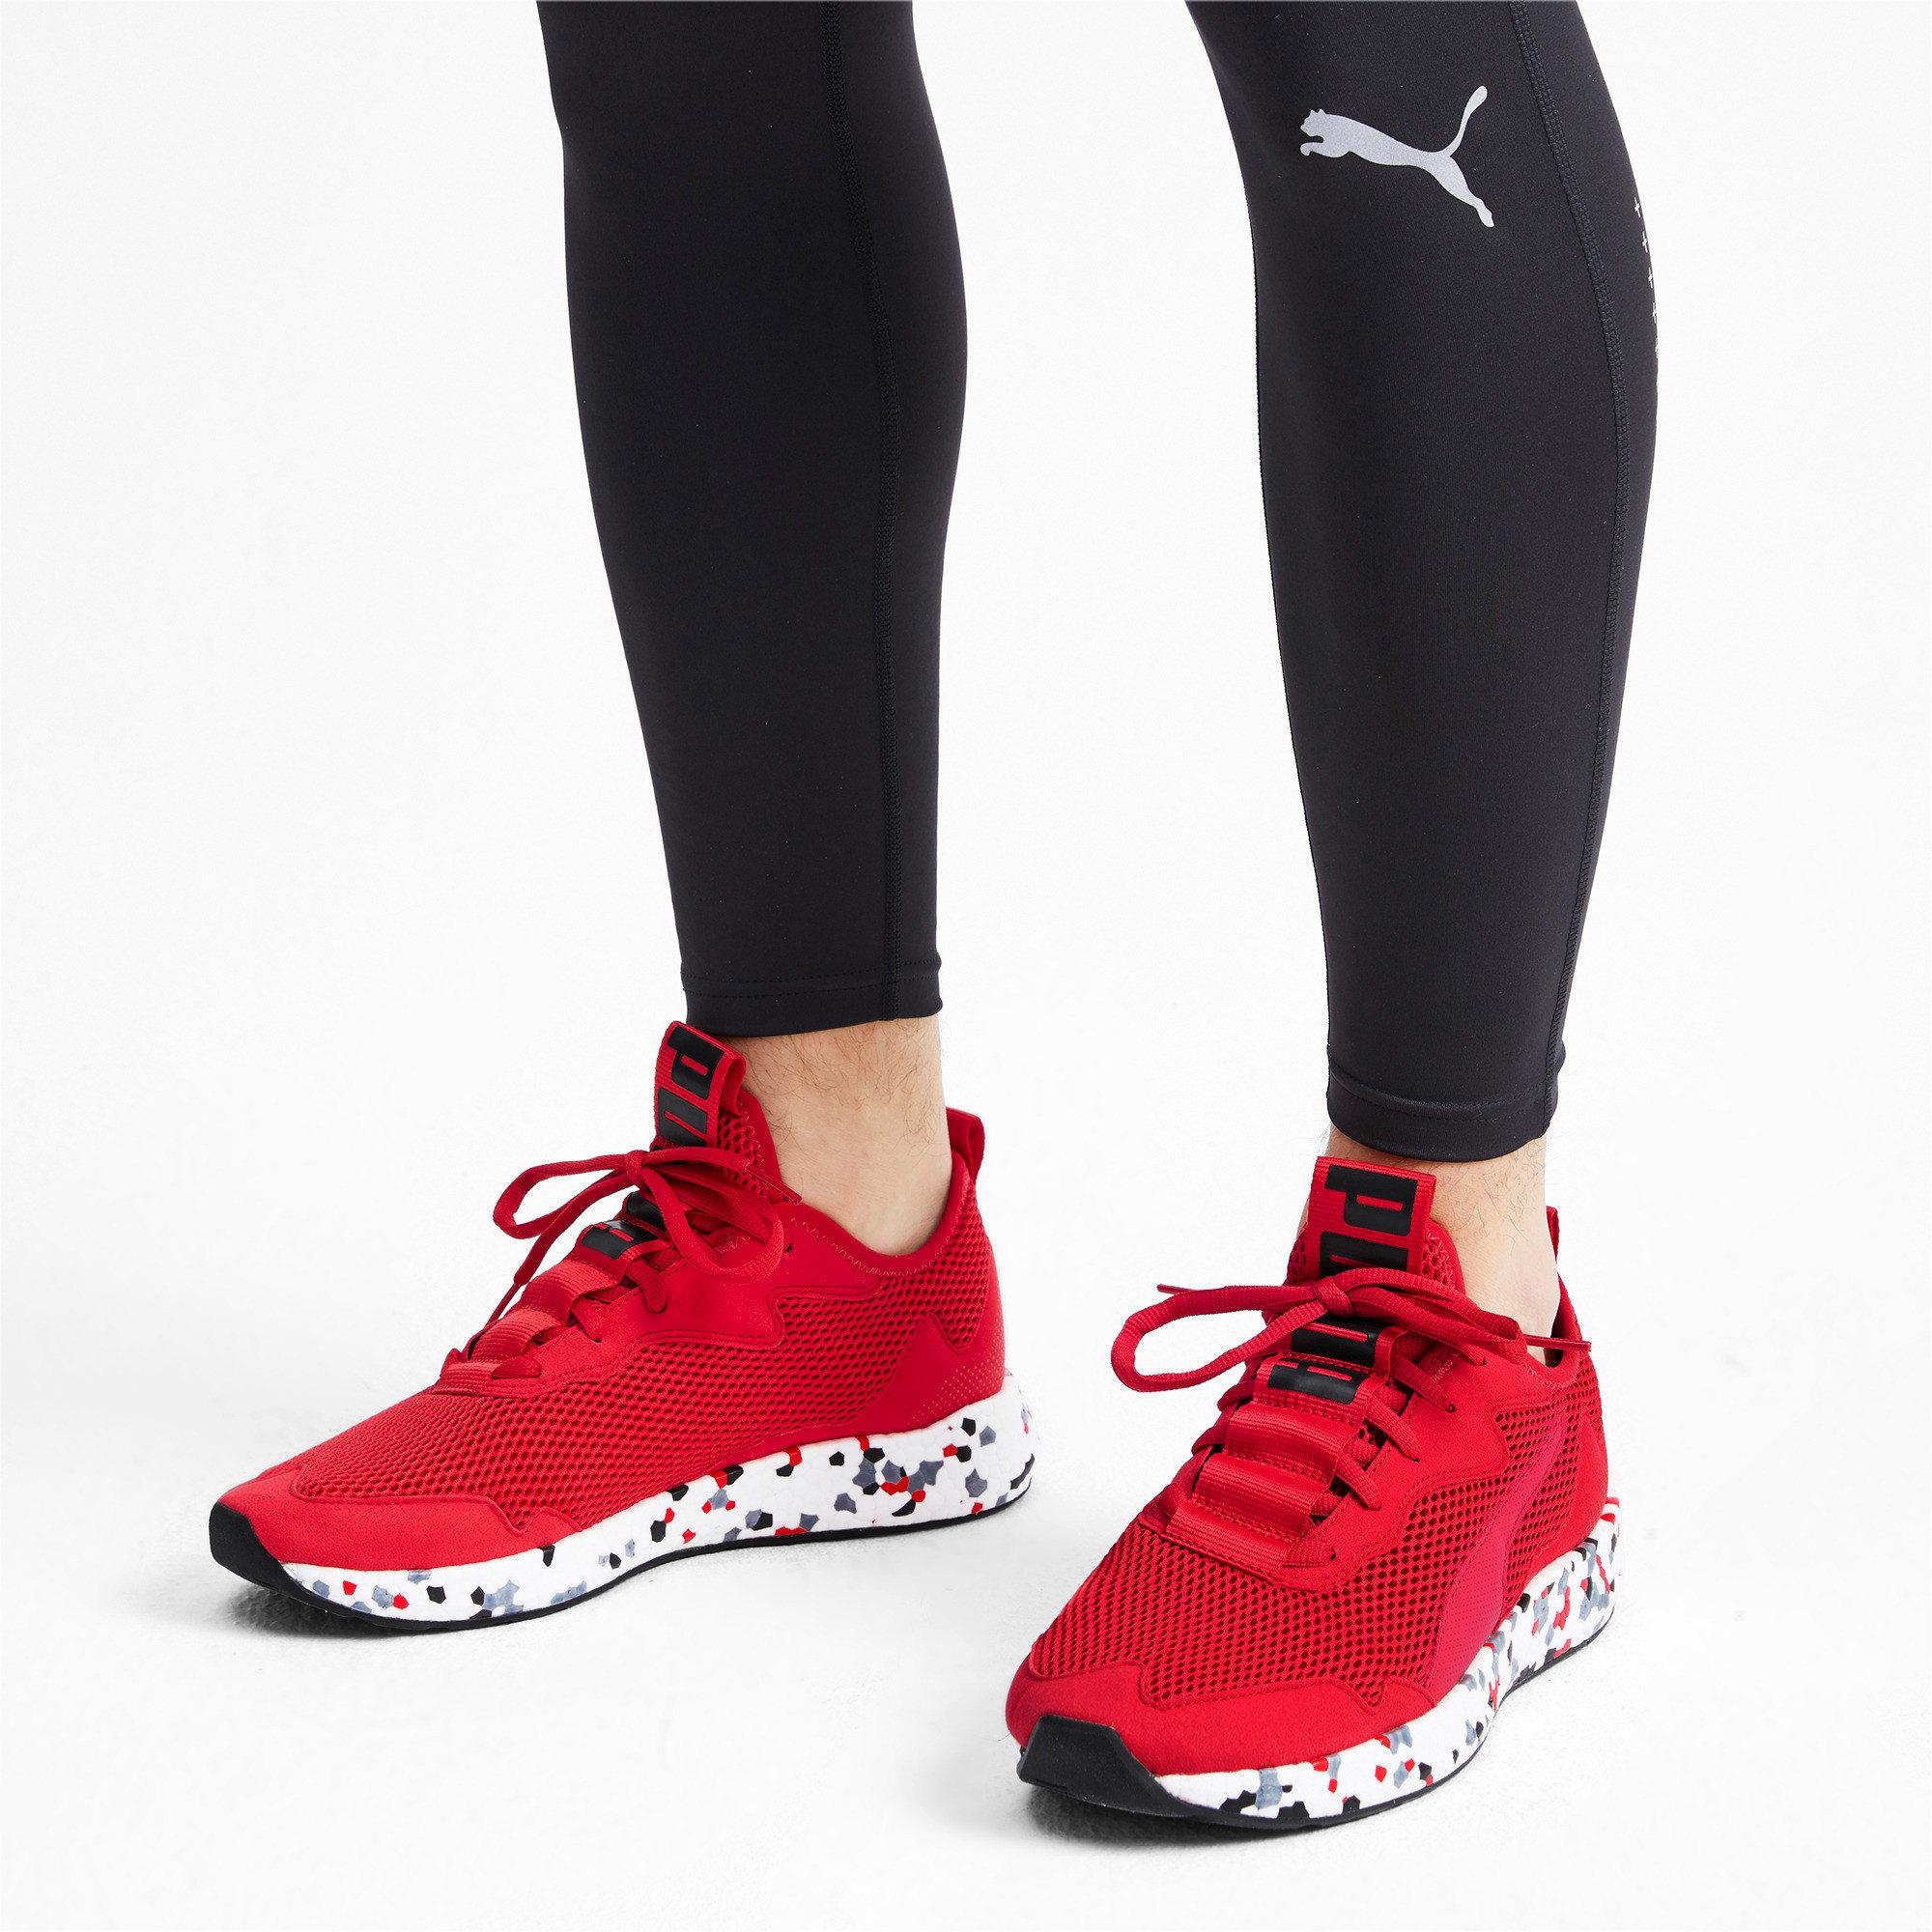 Thumbnail 2 of NRGY Neko Skim Men's Running Shoes, High Risk Red-Puma Black, medium-IND